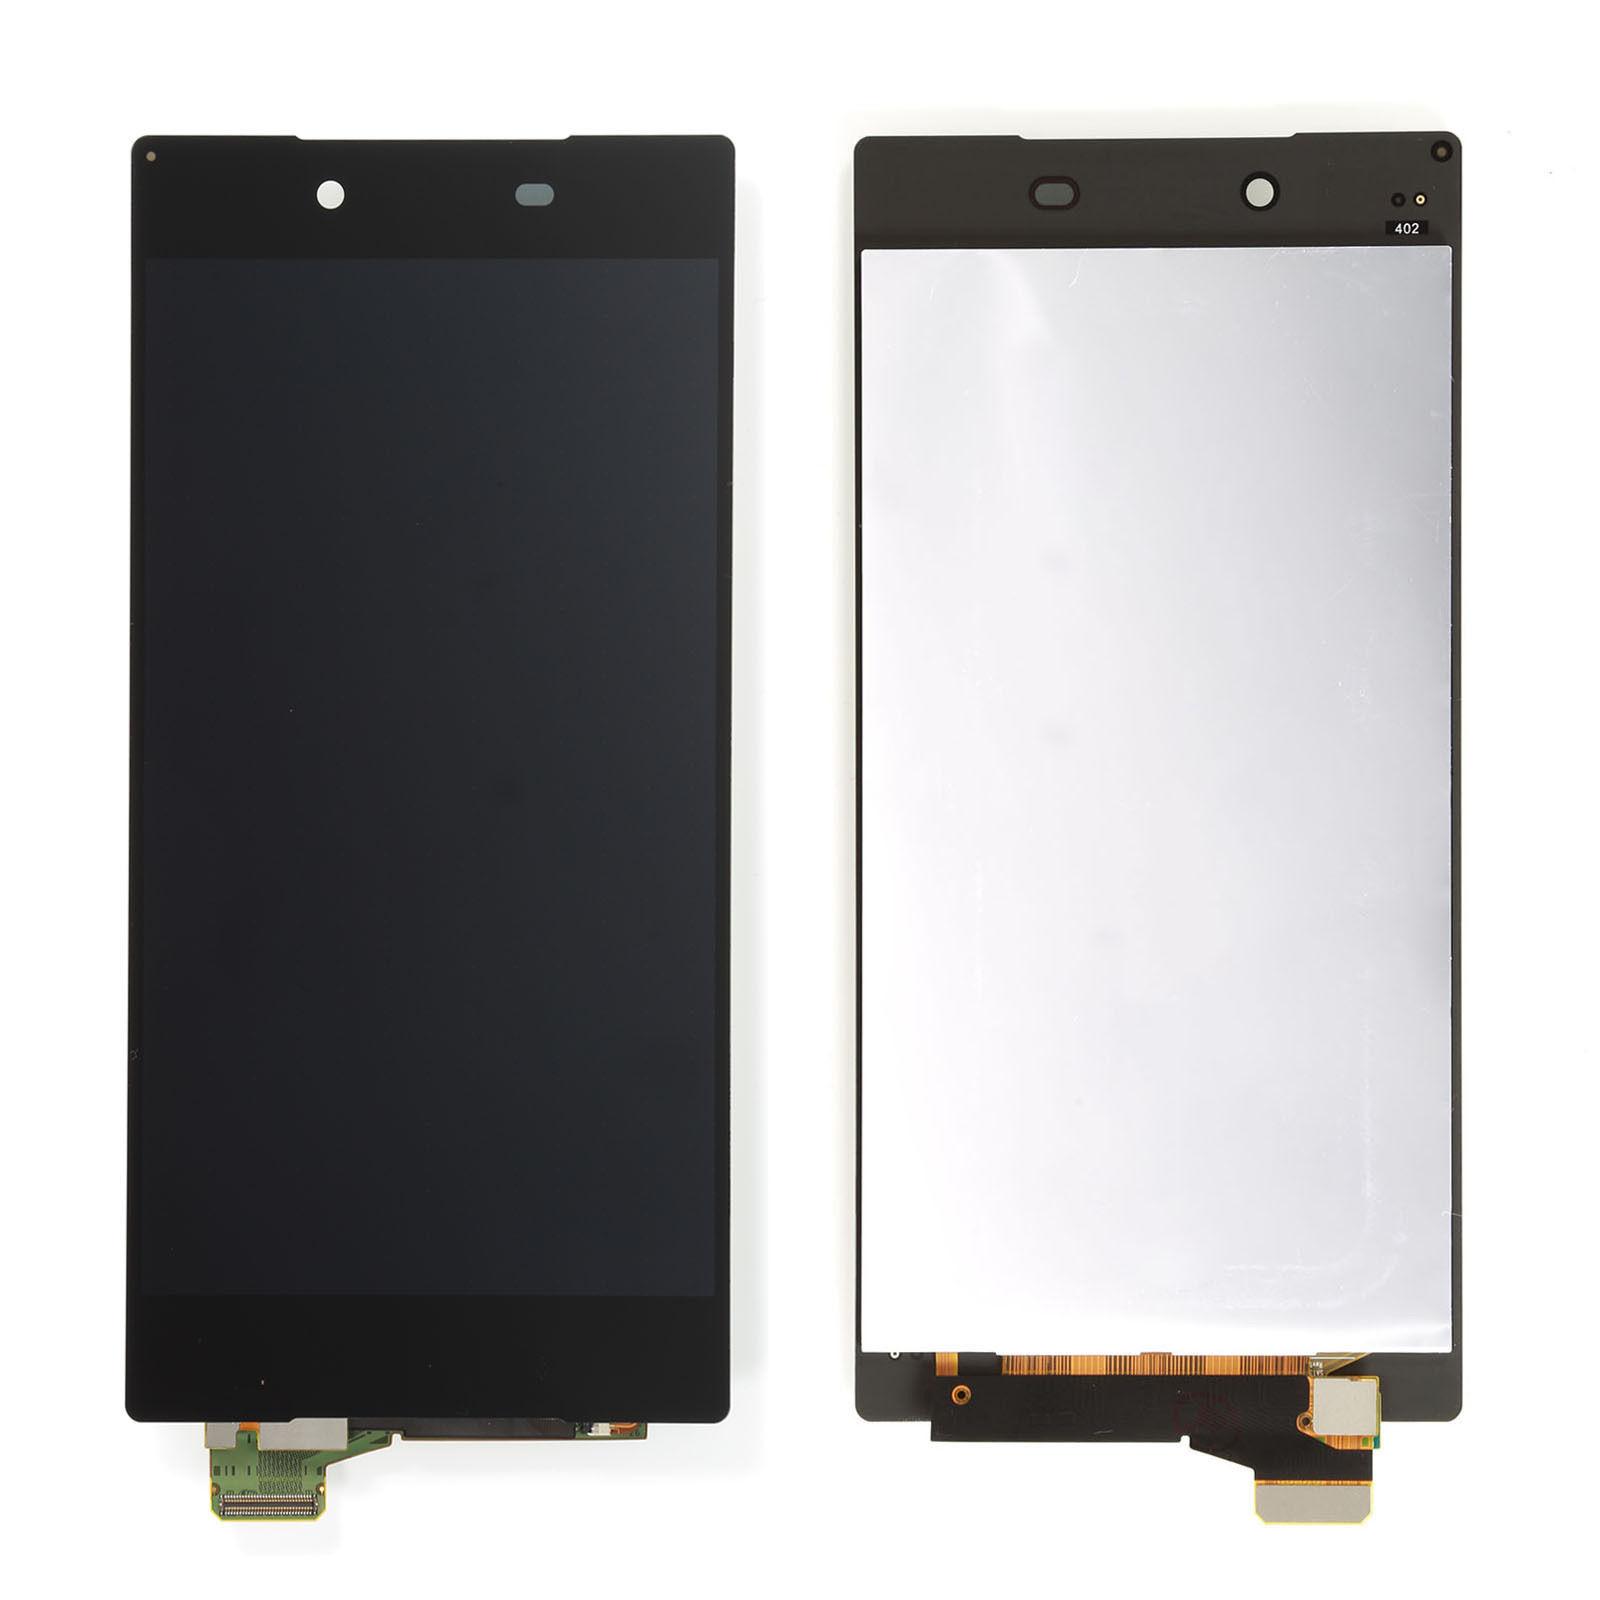 Digitizer - dotykové sklo (plocha) včetně LCD displeje pro Sony Xperia Z5 Premium - černý